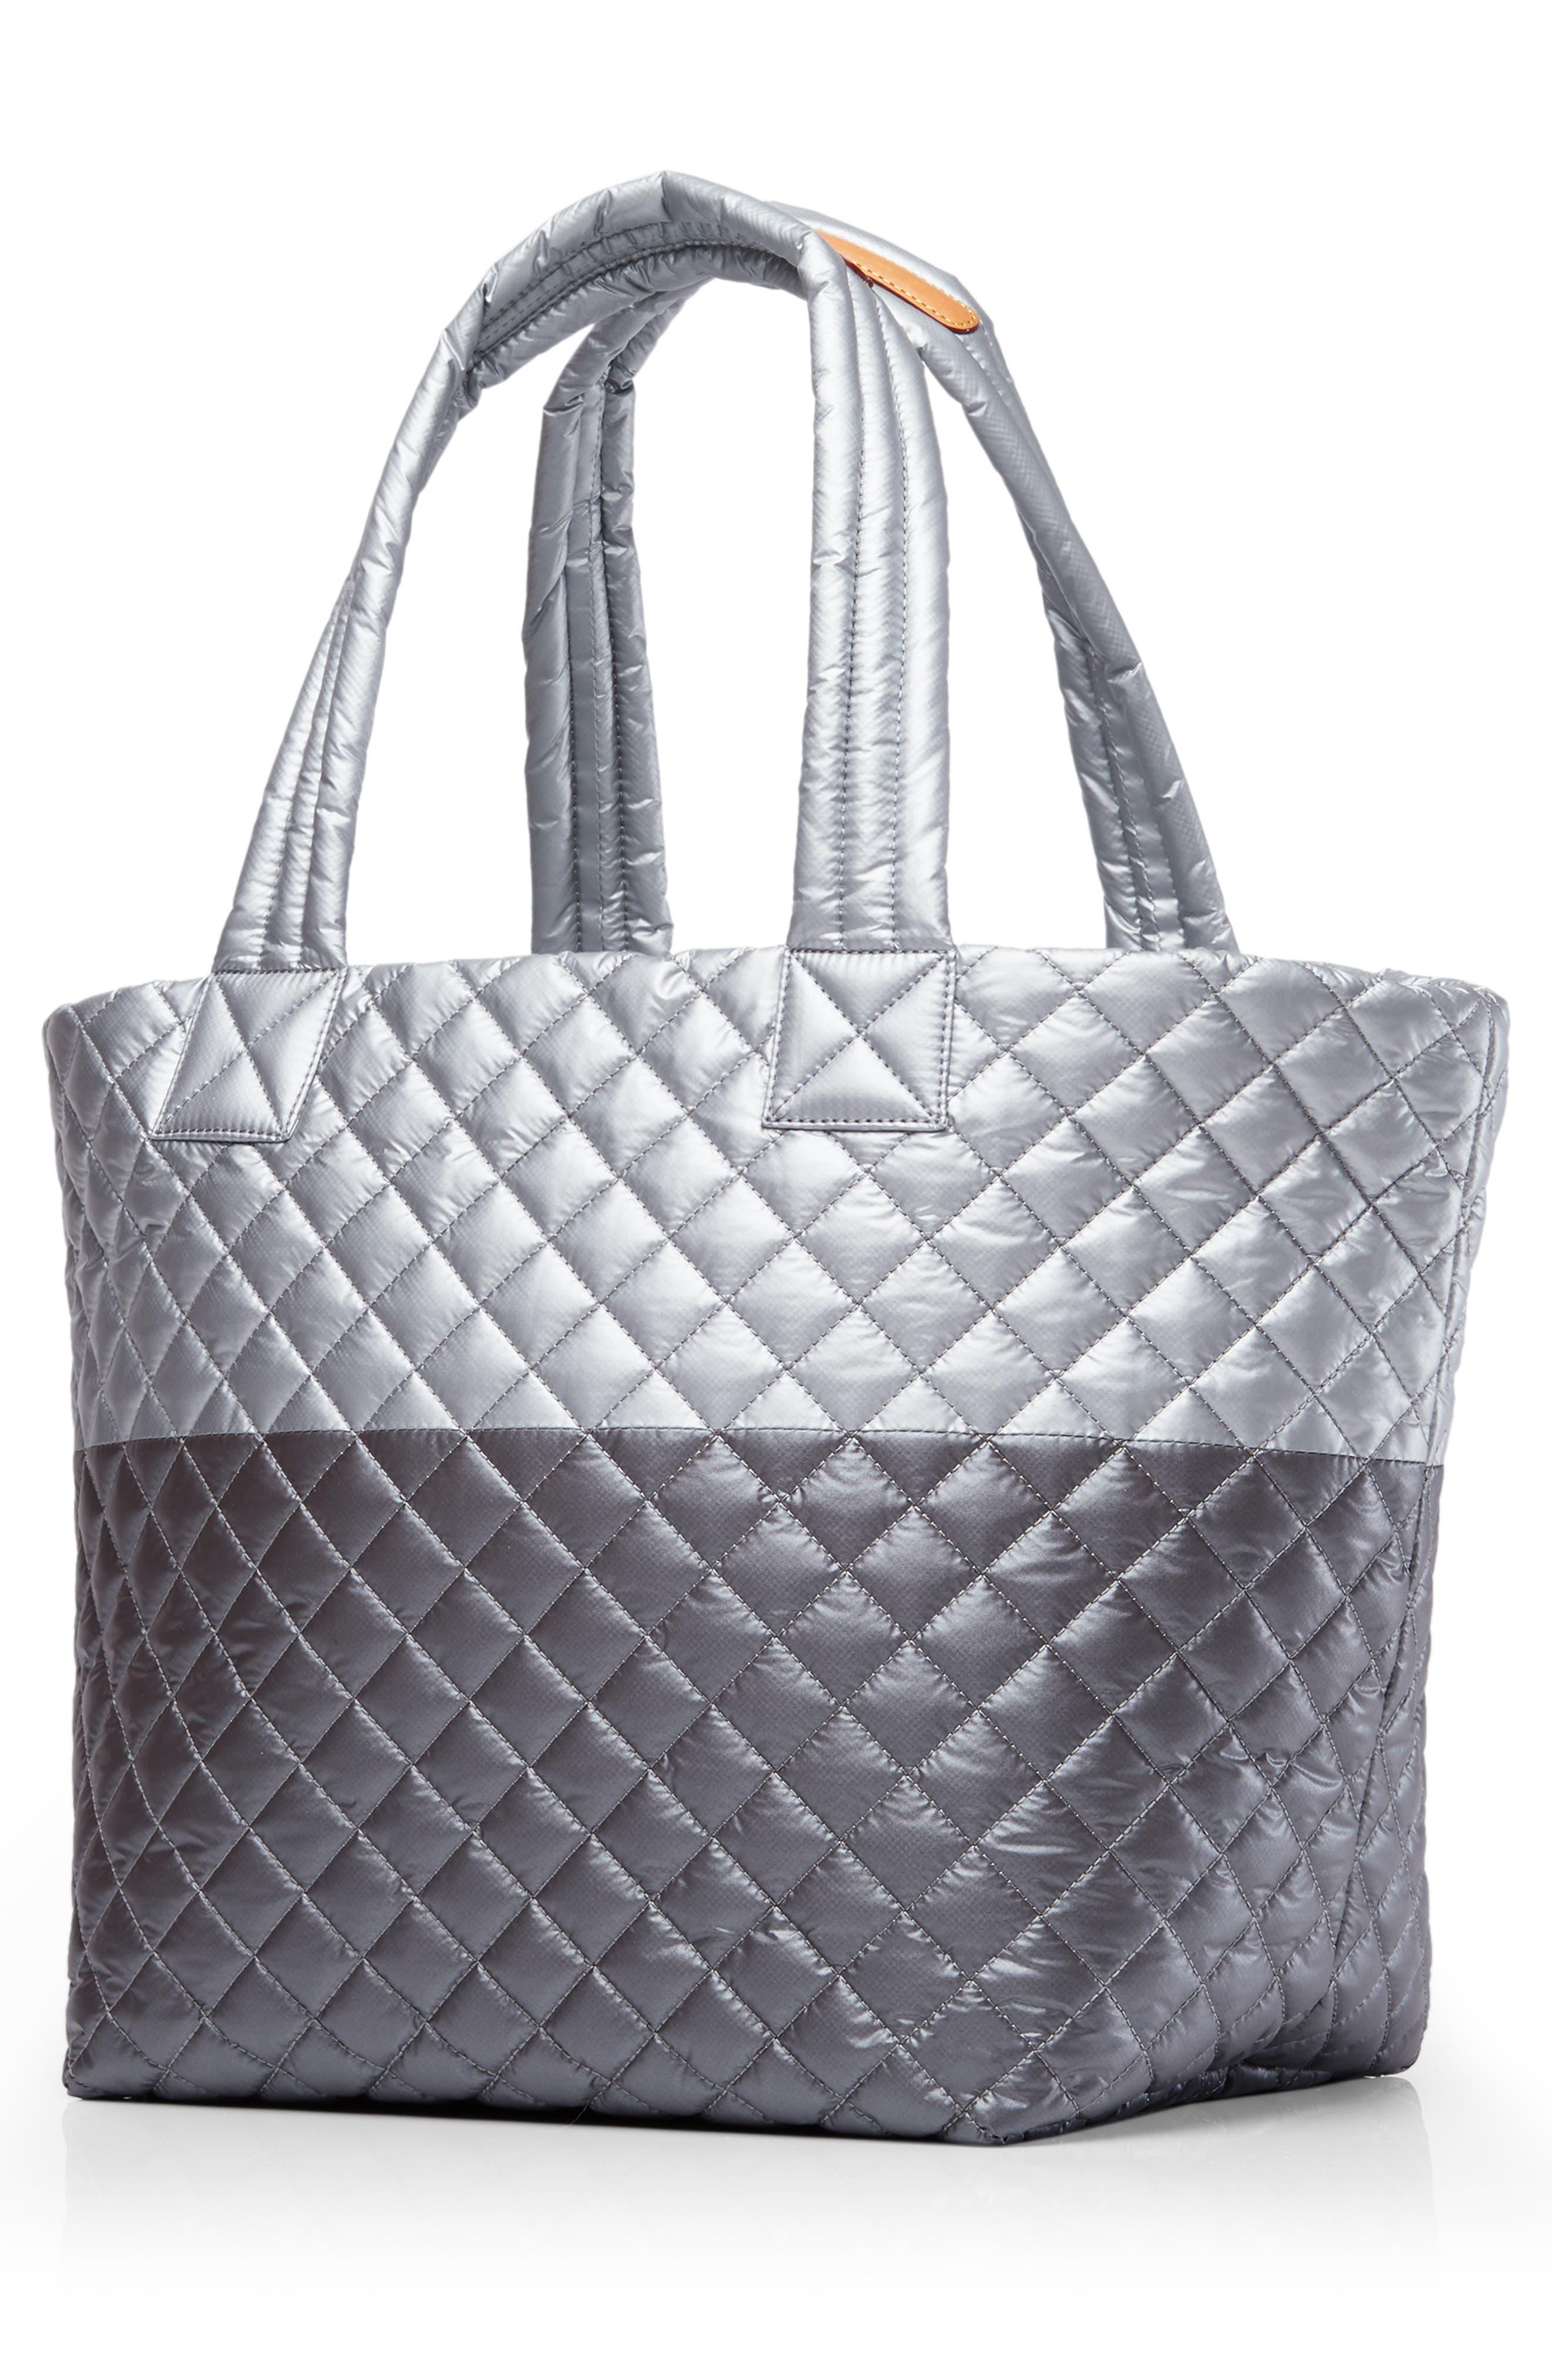 2fcbfd0d Handbags, Purses & Wallets | Nordstrom